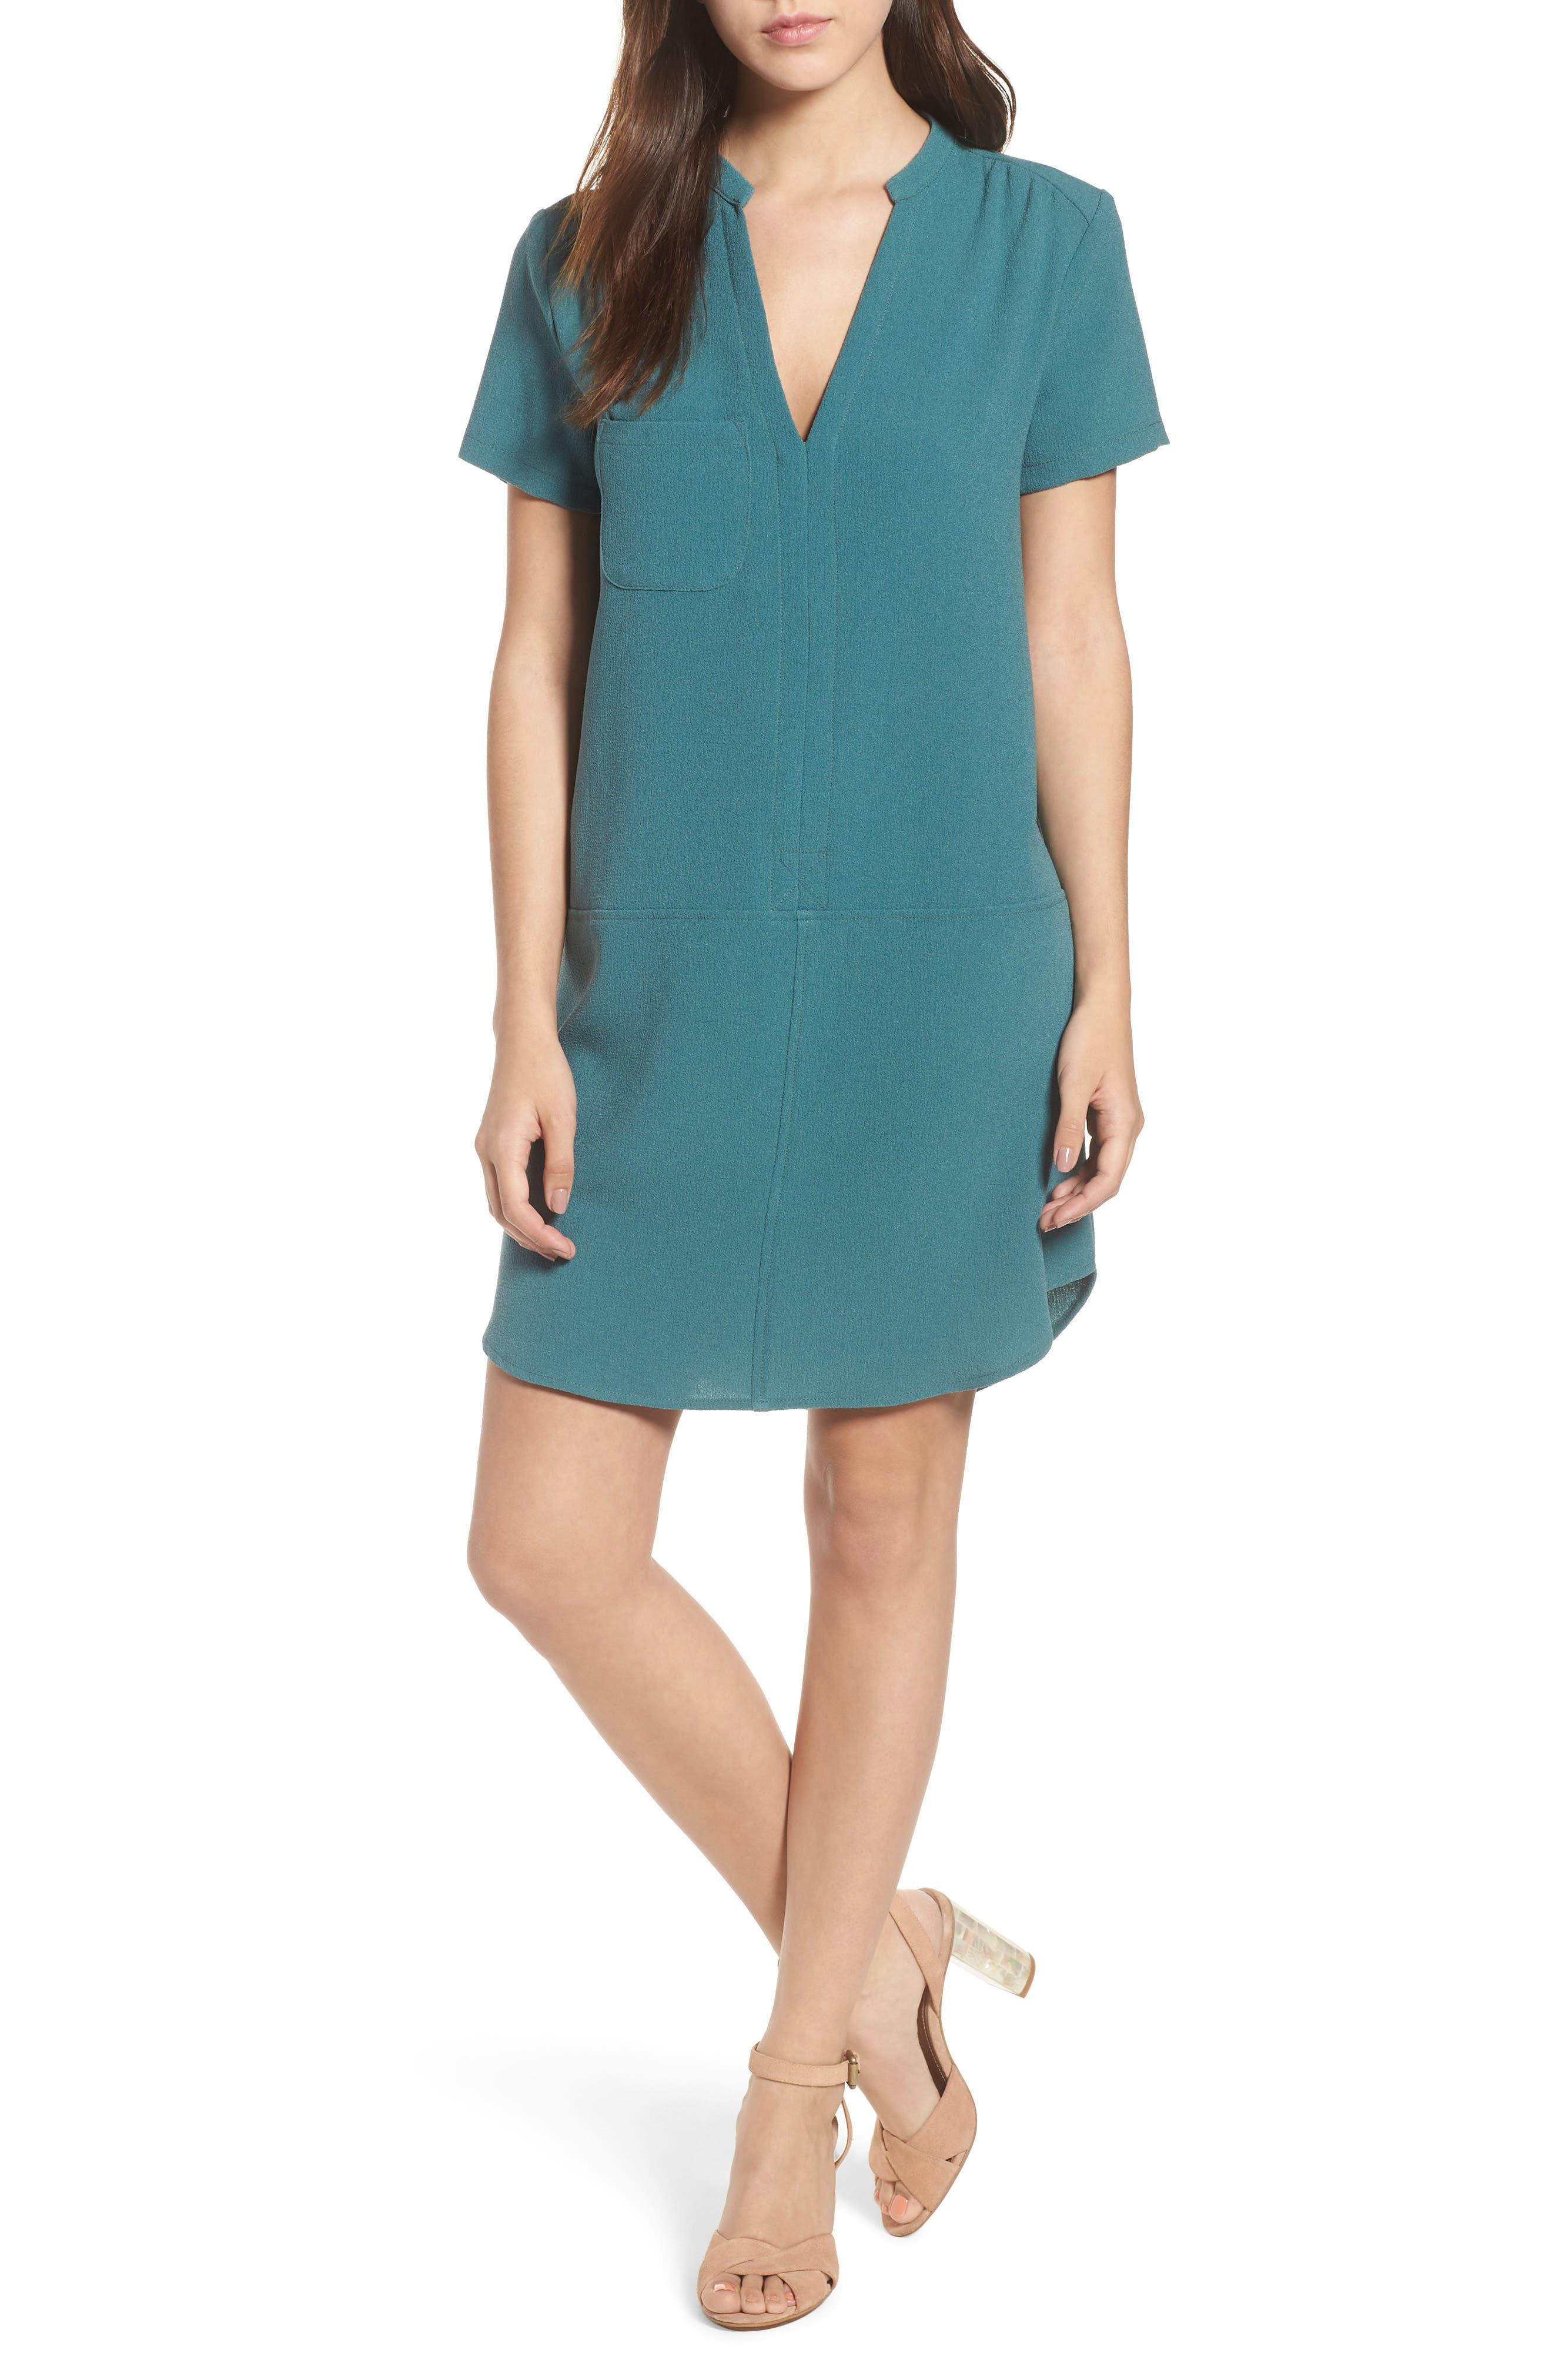 Hailey Crepe Dress,                             Main thumbnail 1, color,                             HYDRO TEAL